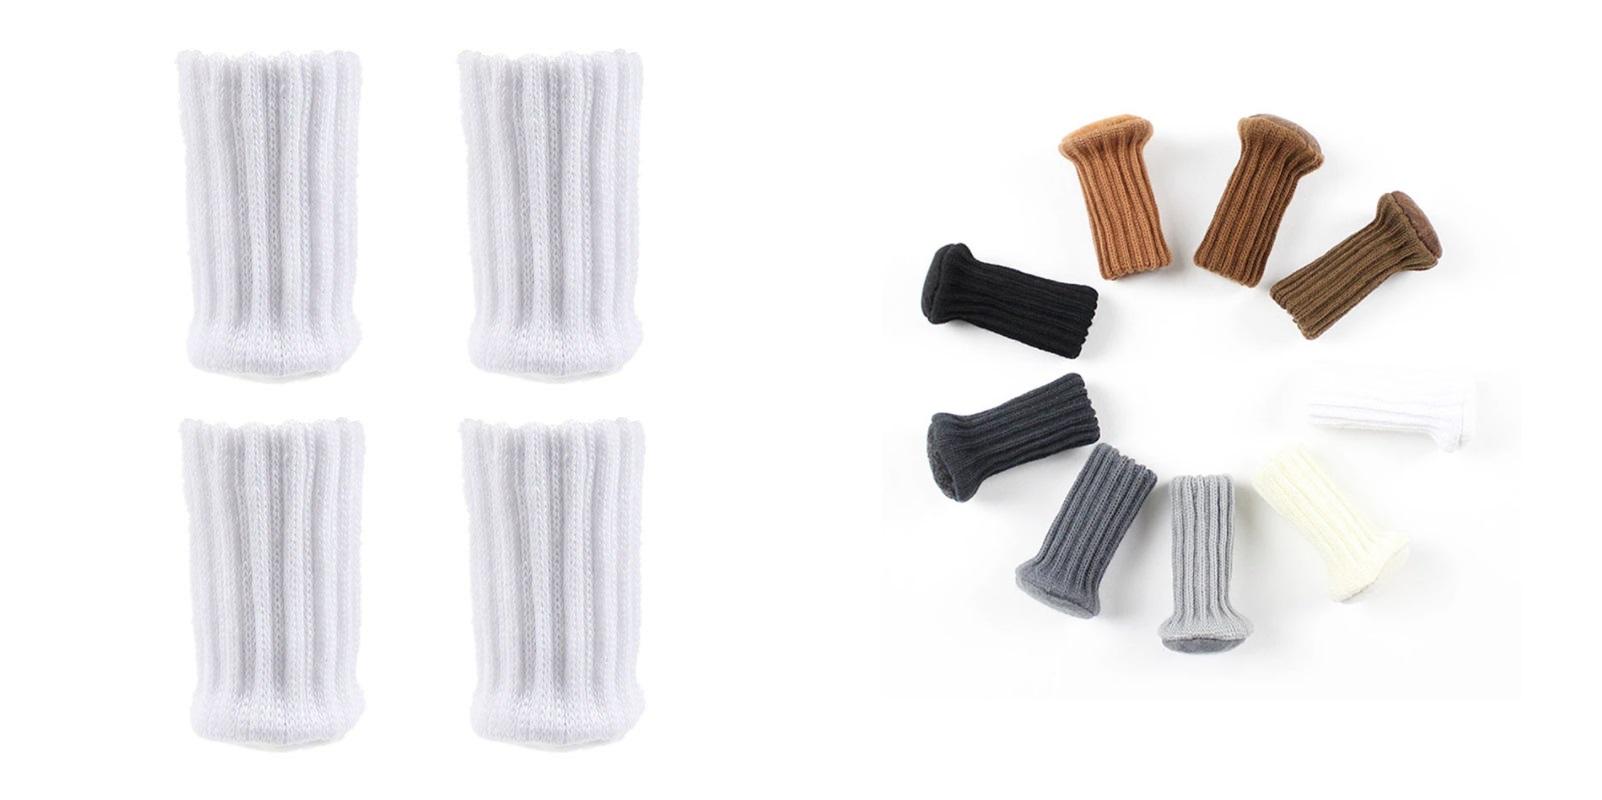 Ochranné návleky na nohy od židle (4 ks) / A-001335a / DOPRAVA ZDARMA